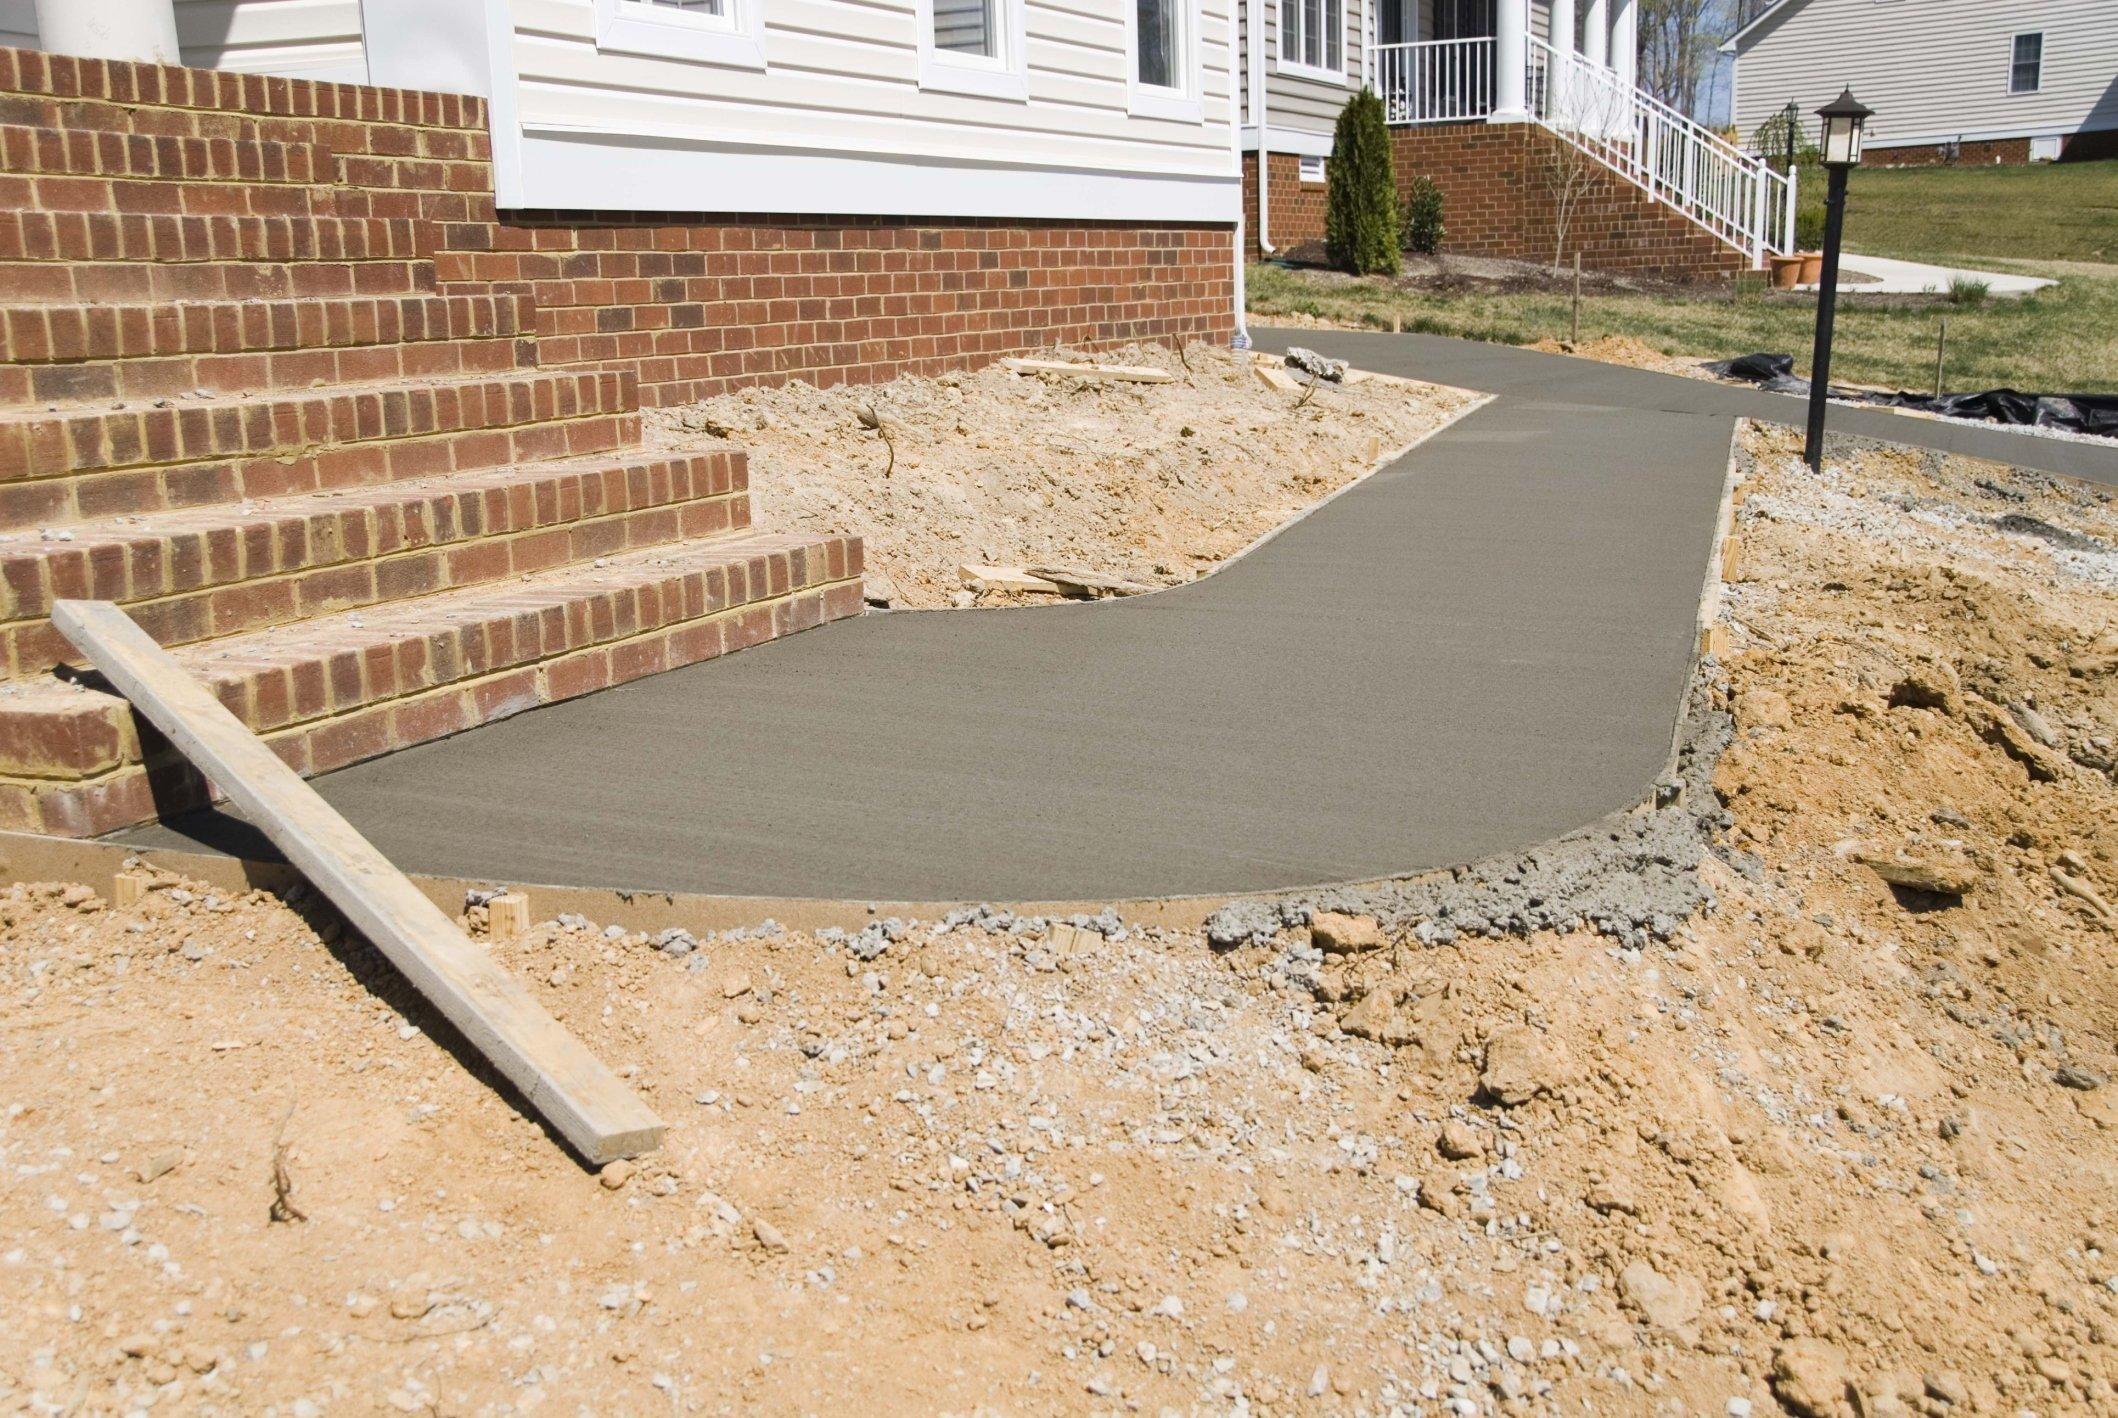 new pavement and sidewalks